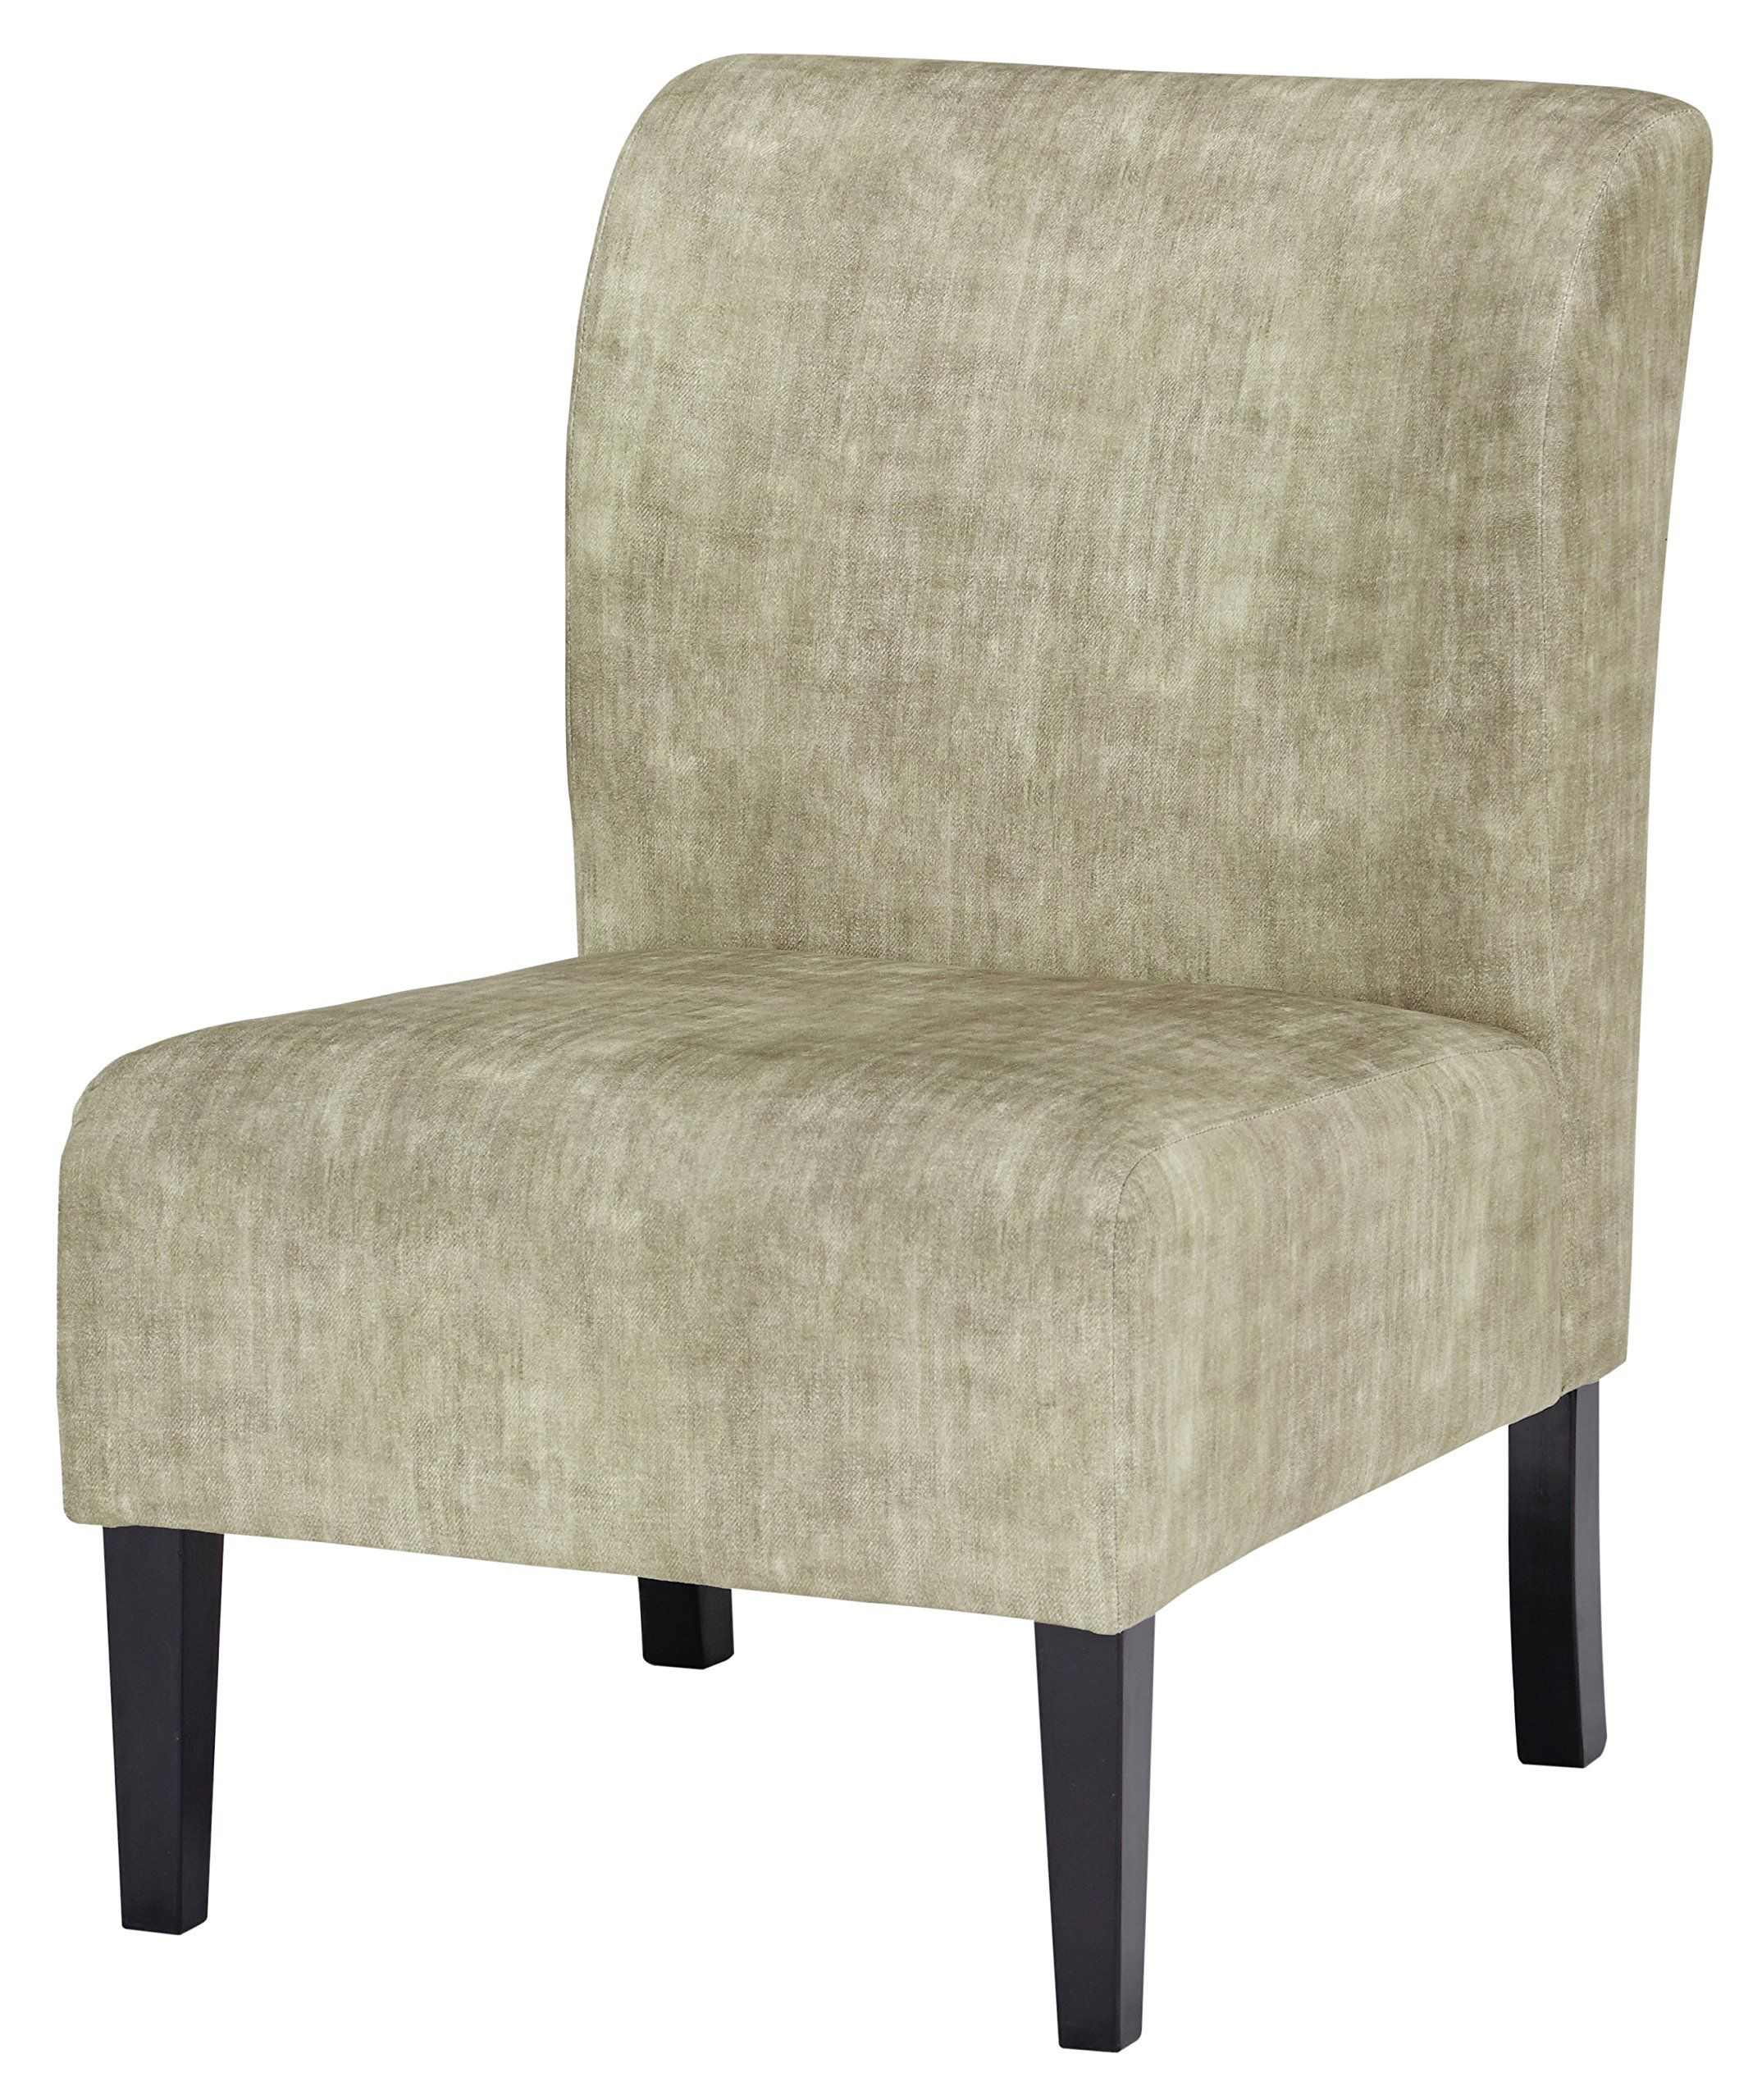 Ashley Furniture Signature Design Triptis Accent Chair